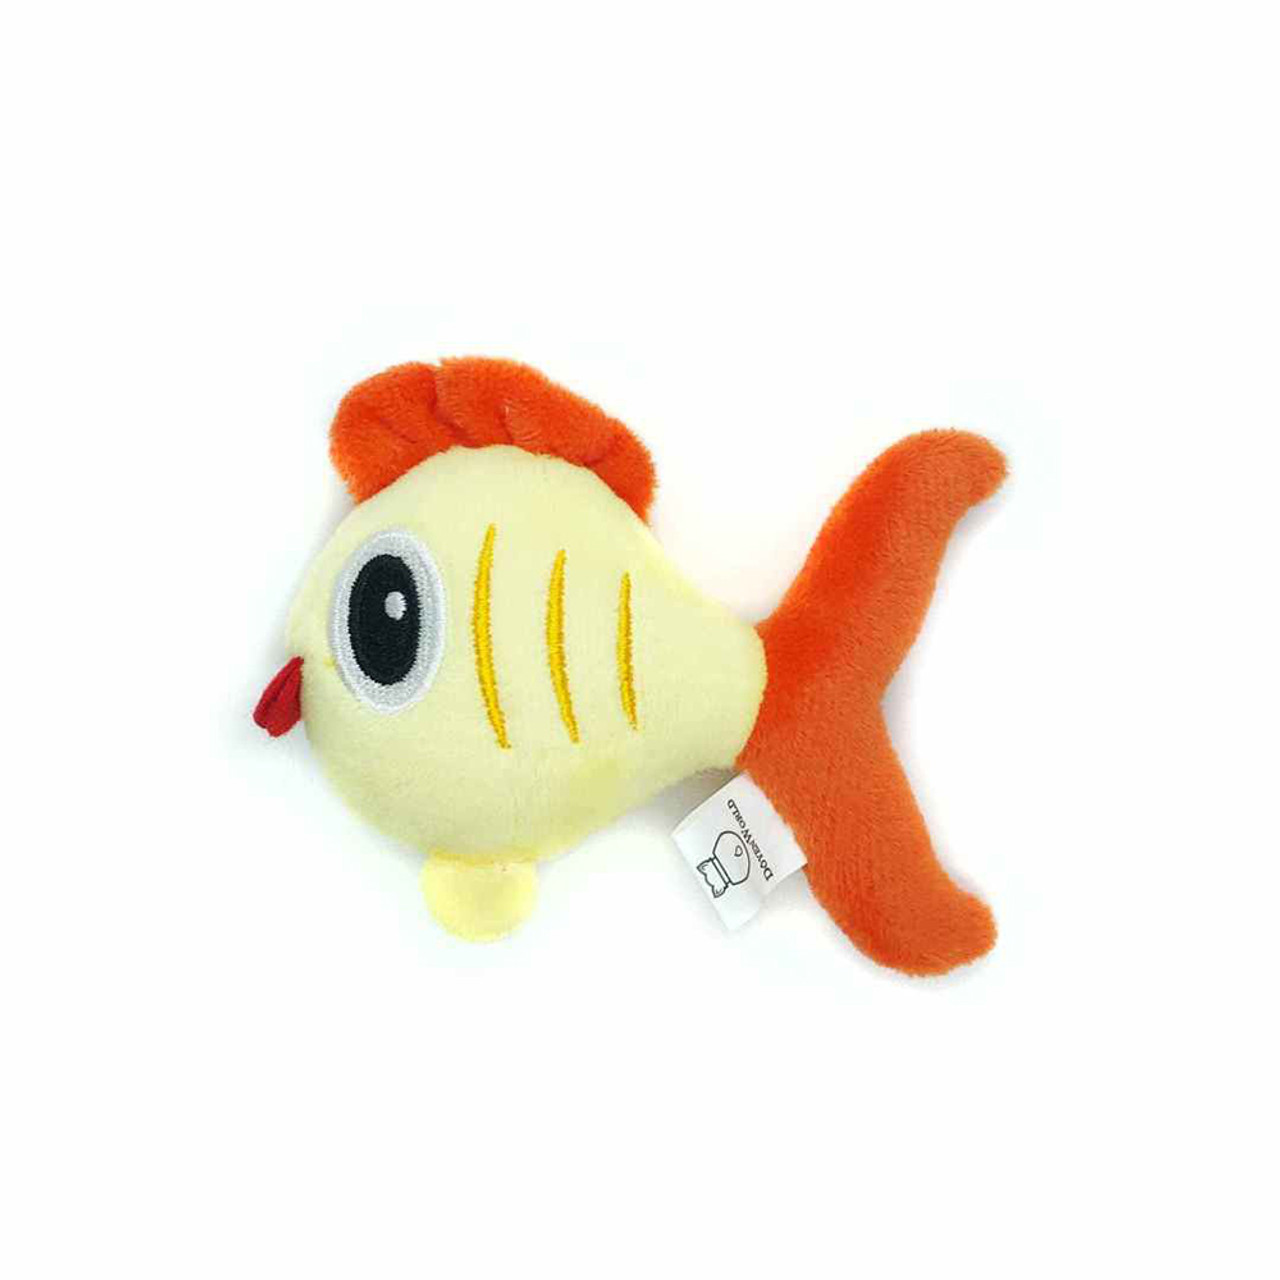 Doyen Sea Buddies Fish Catnip Plush Cat Toy